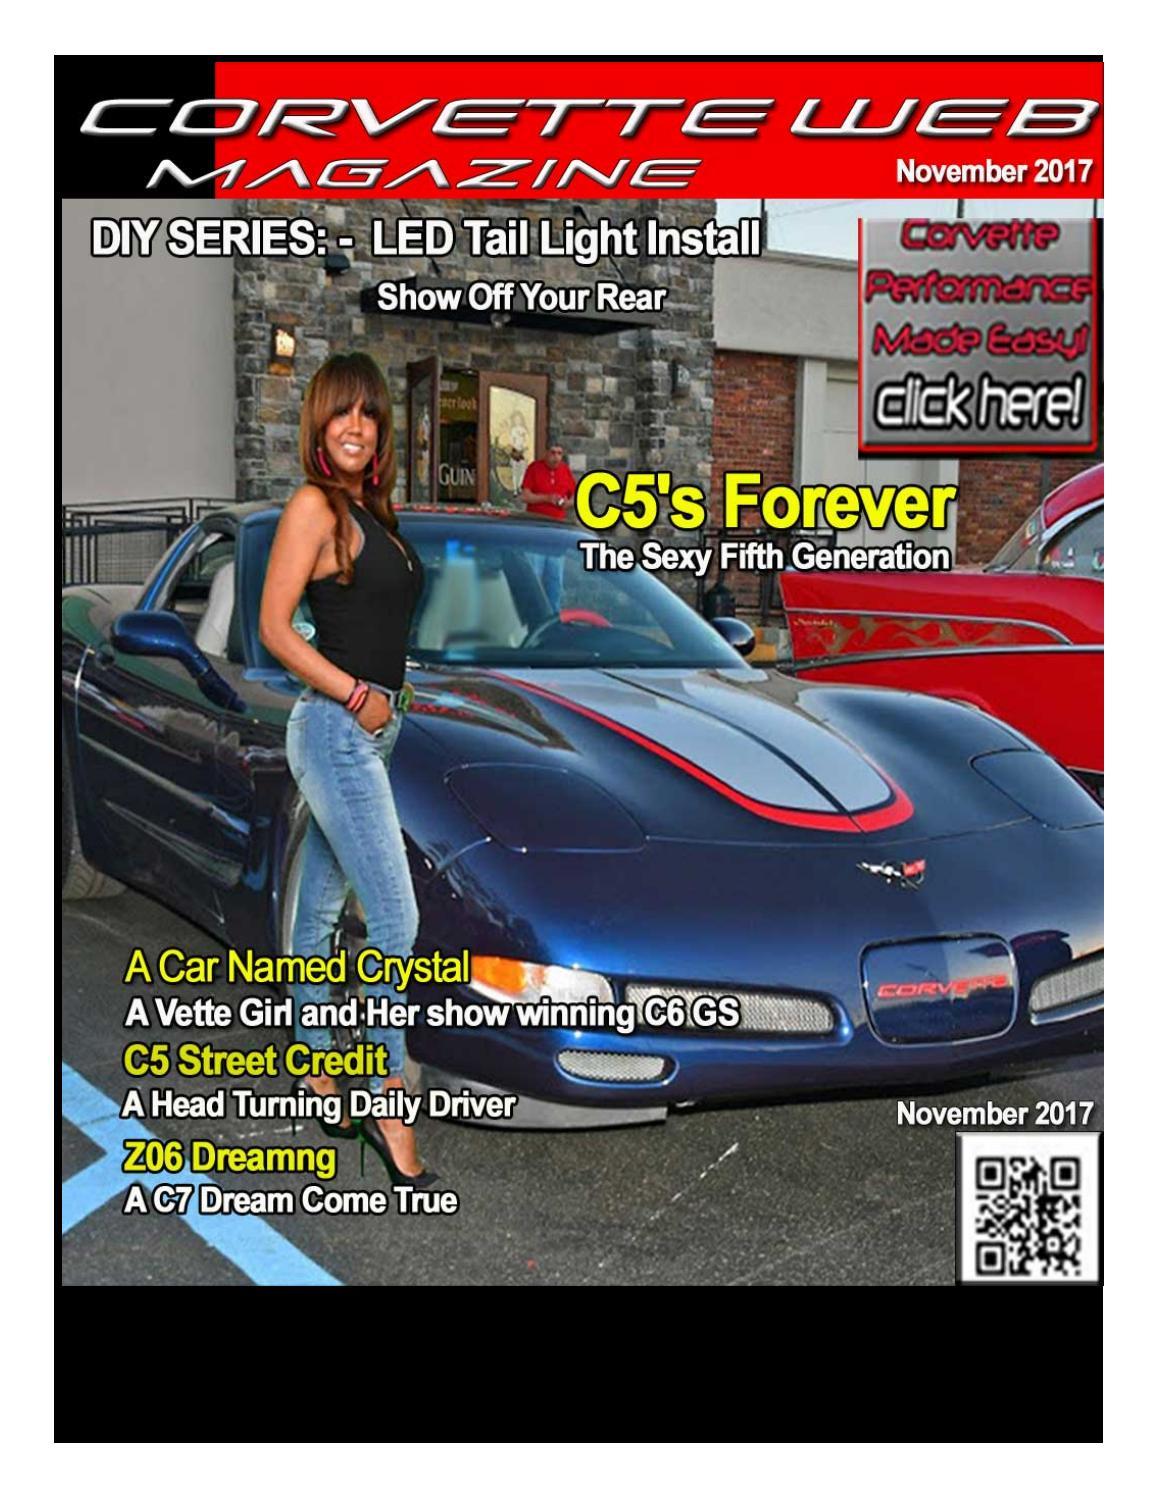 Ring for Corvette C6 Headlight Lens 2005-2013 GASKETS 2x Pair Sealing WASHER